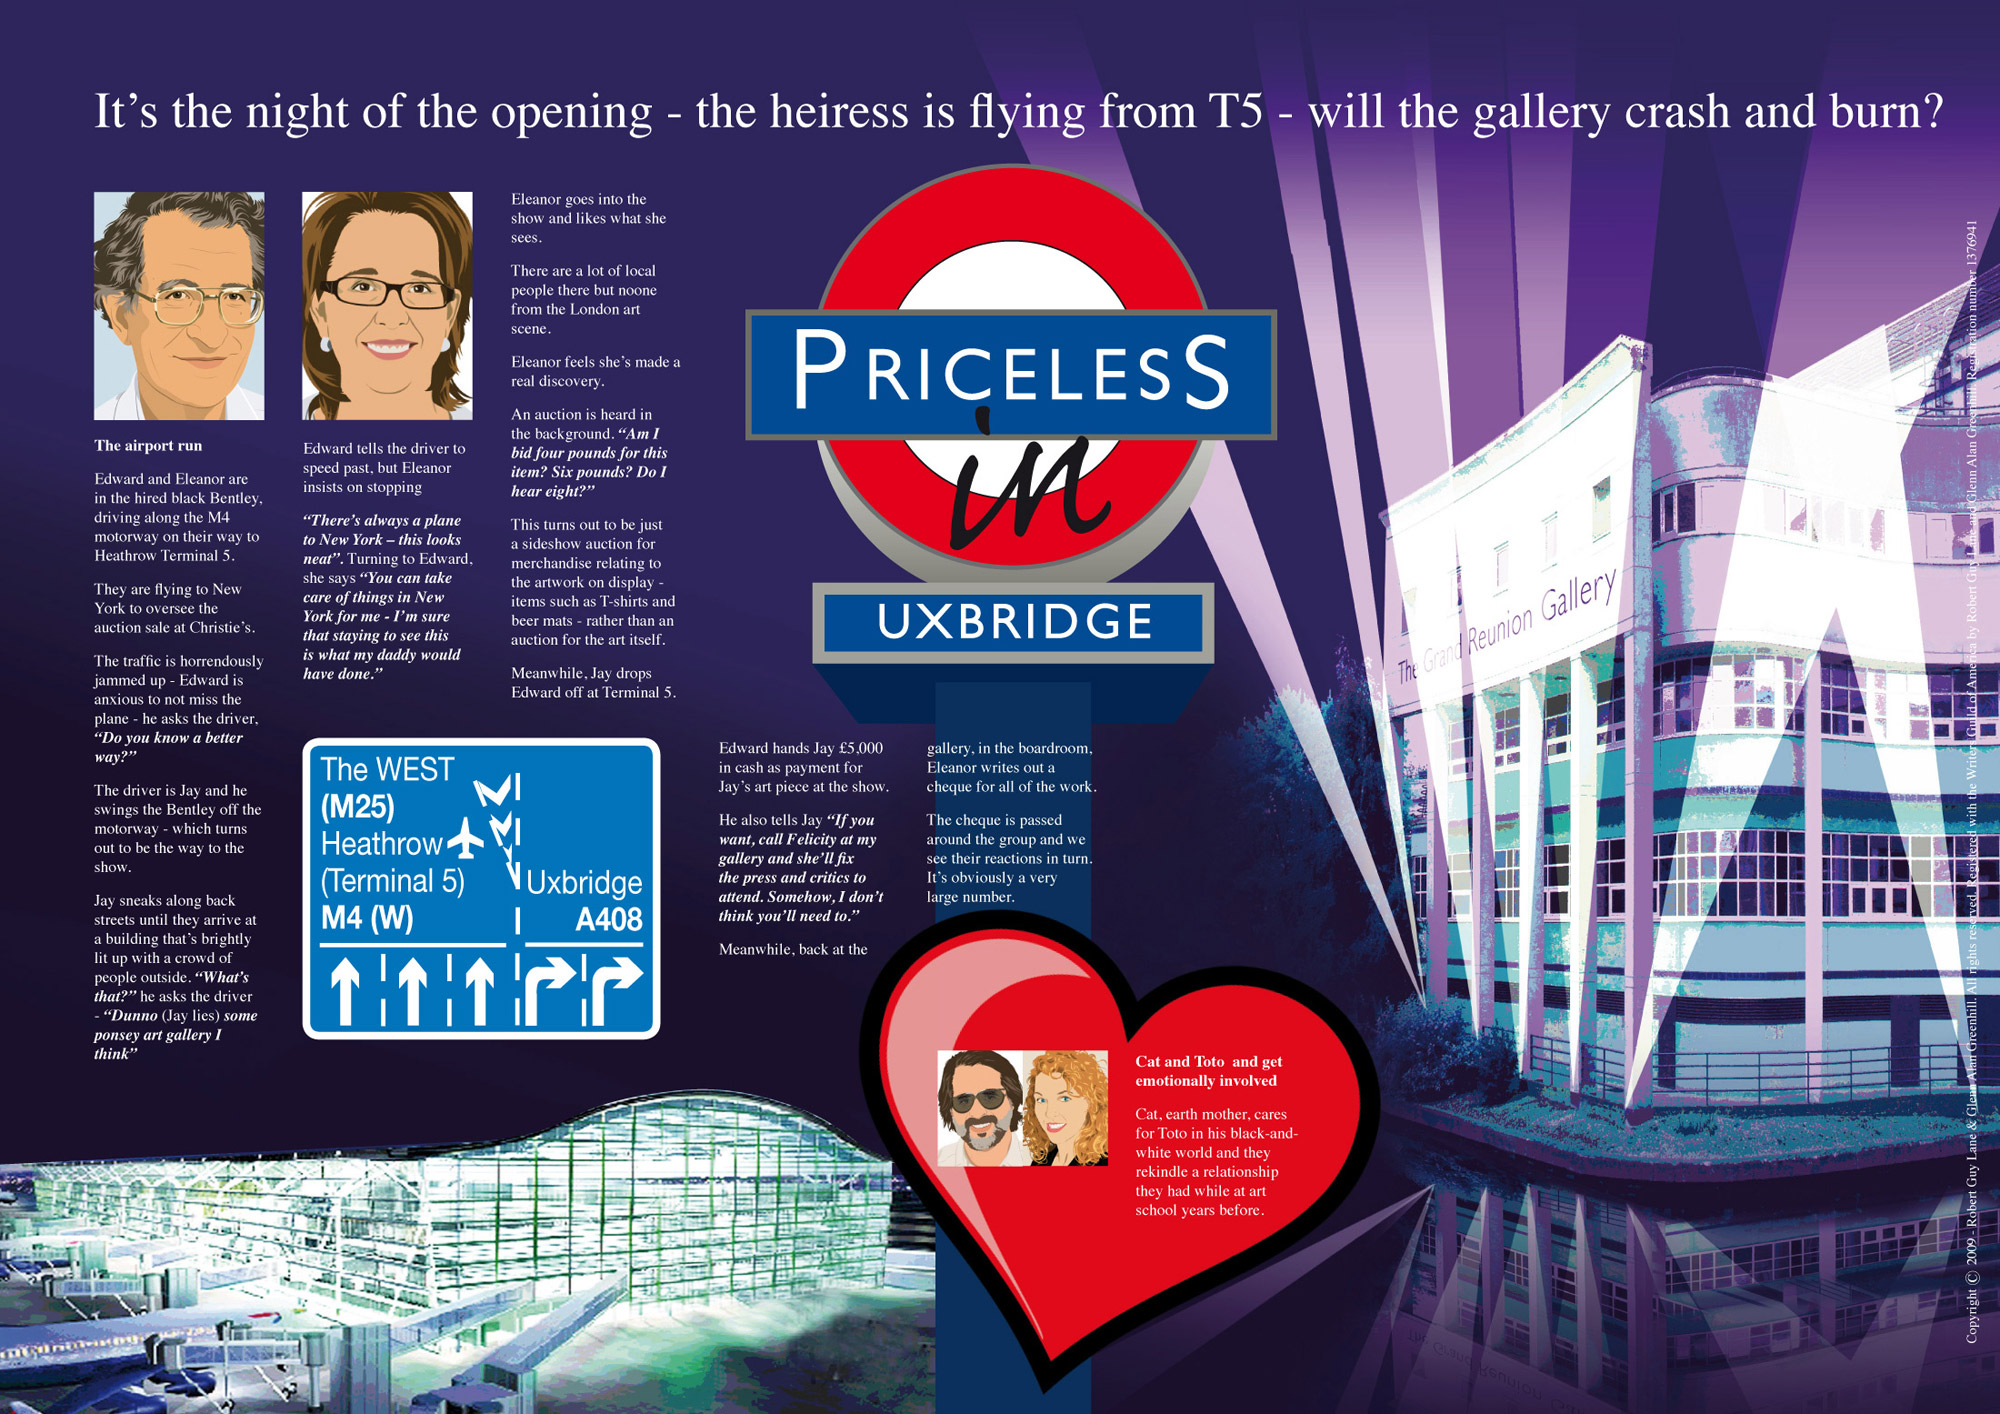 priceless_in_uxbridge_09b